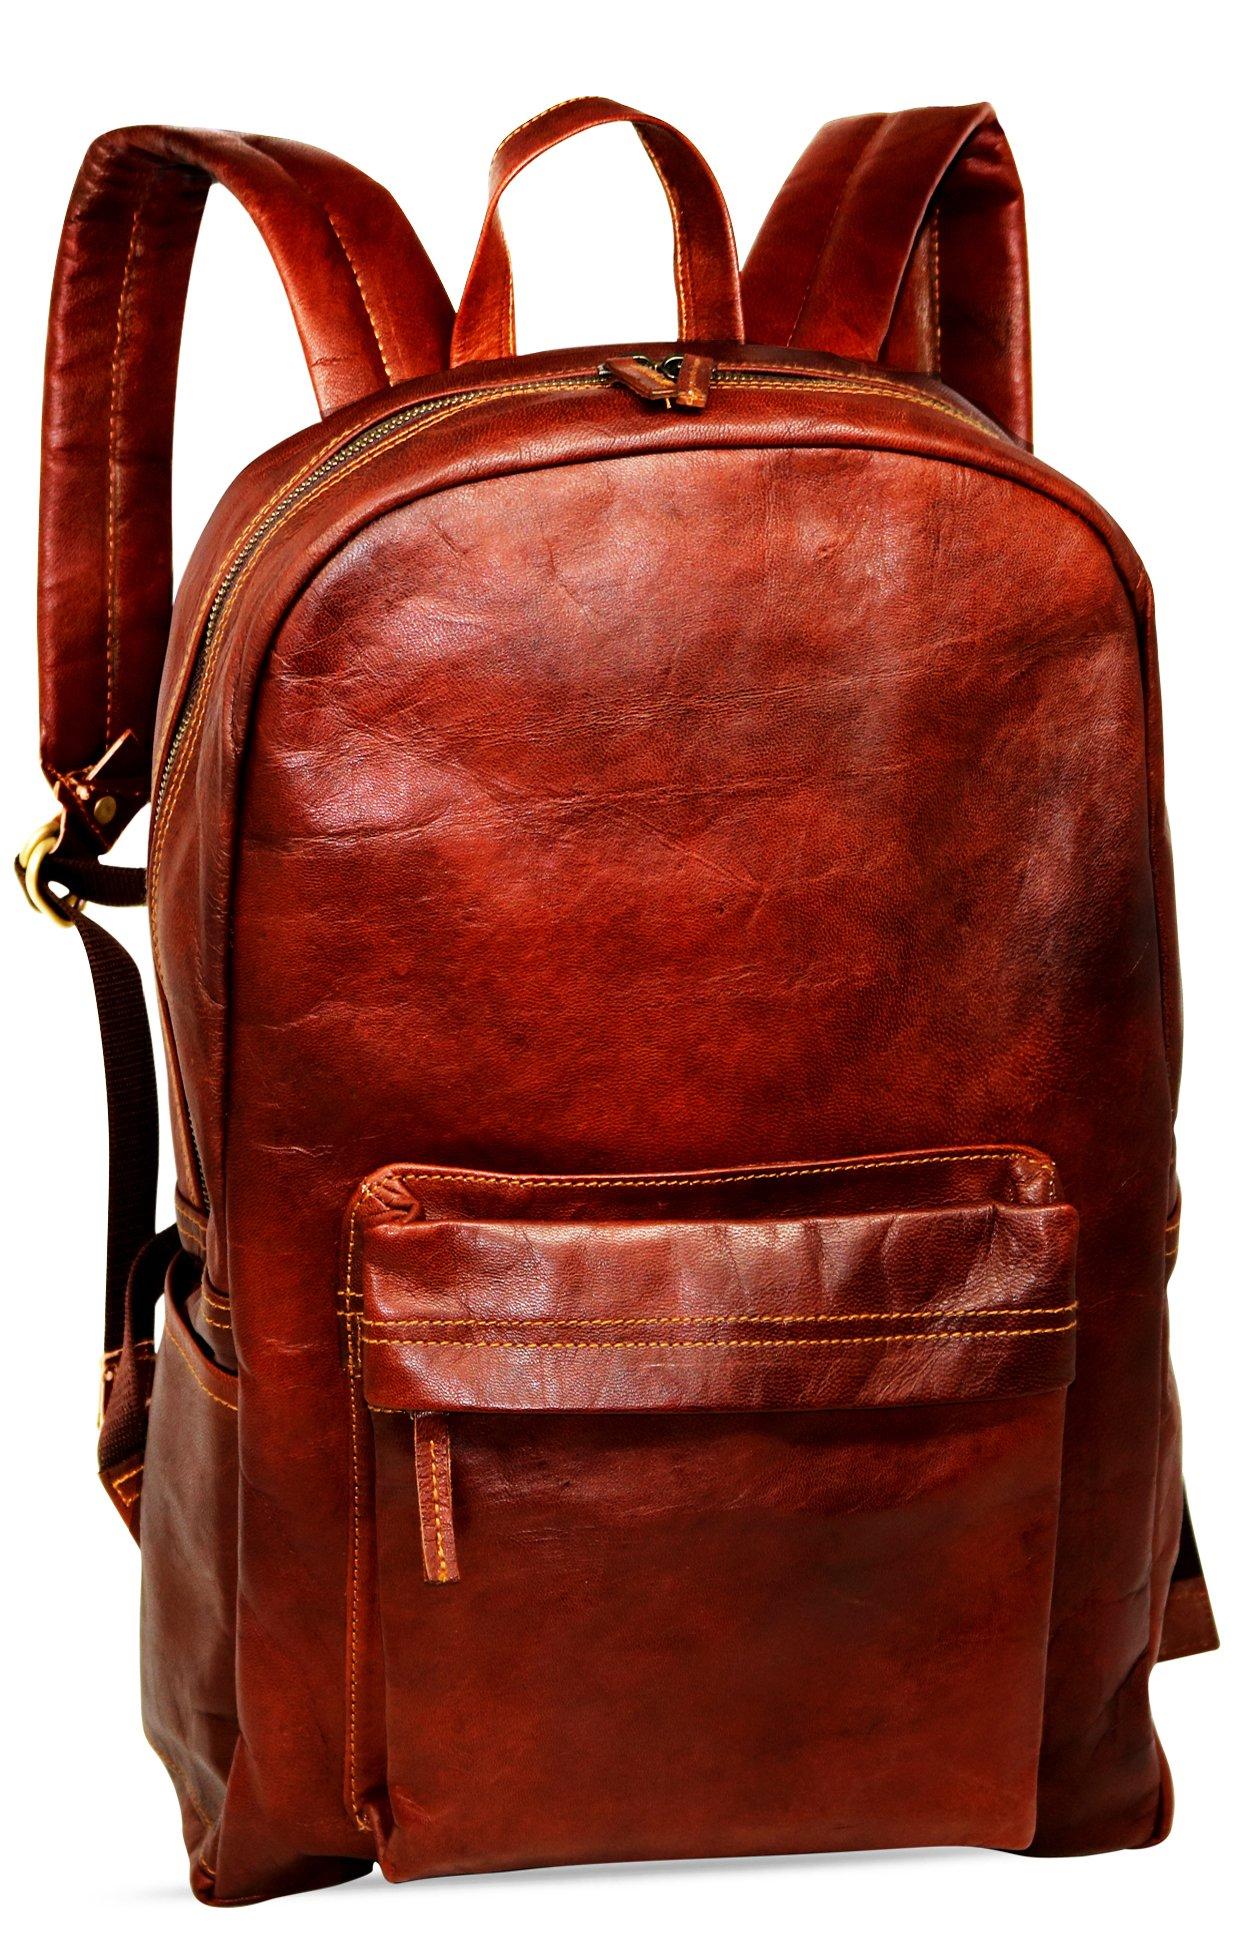 18'' Brown Leather Backpack Vintage Rucksack Laptop Bag Water Resistant Casual Daypack College Bookbag Comfortable Lightweight Travel Backpack Hiking/Picnic Bag for Men